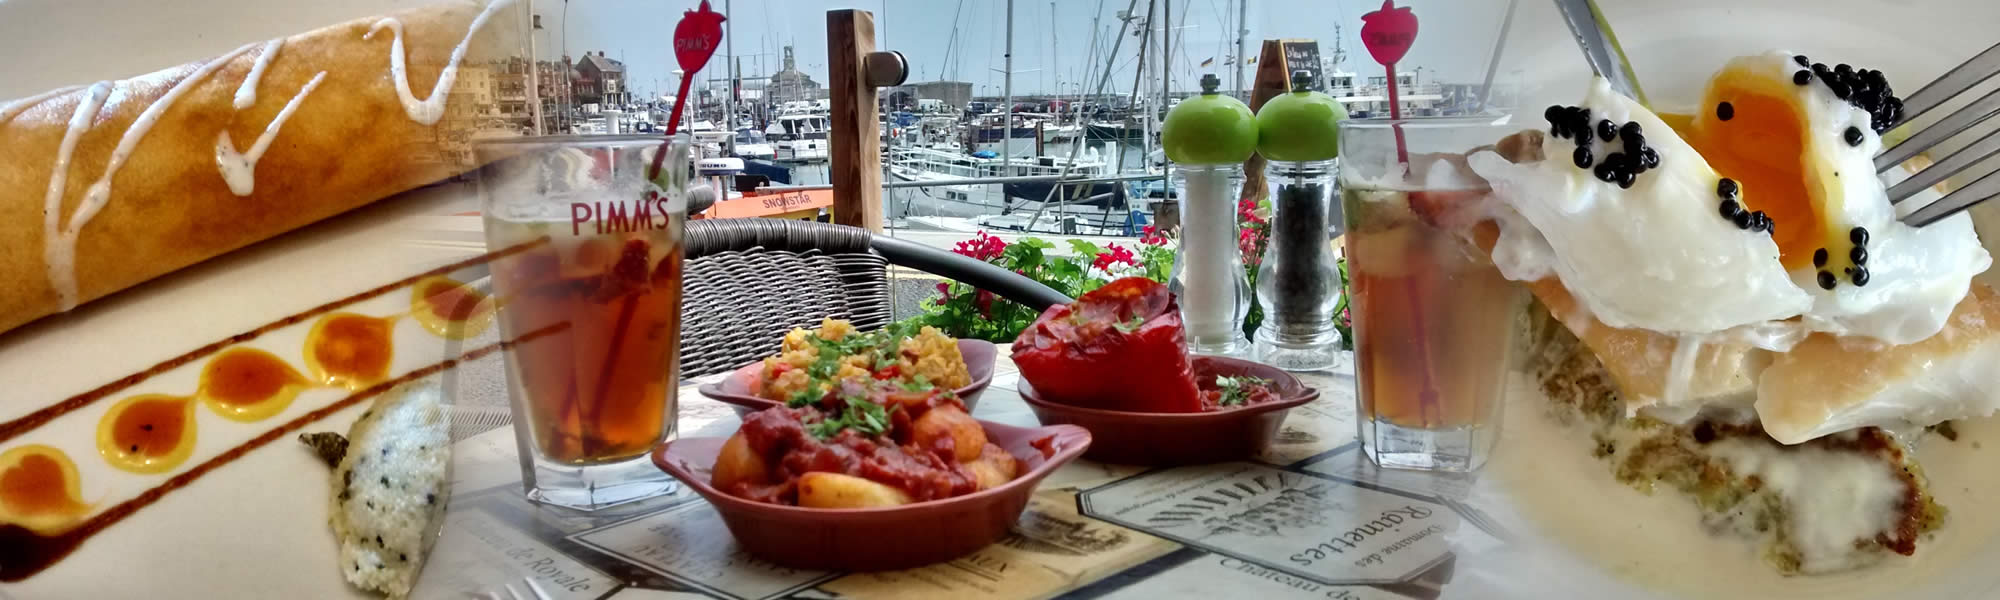 Eating in Ramsgate - Visit Ramsgate